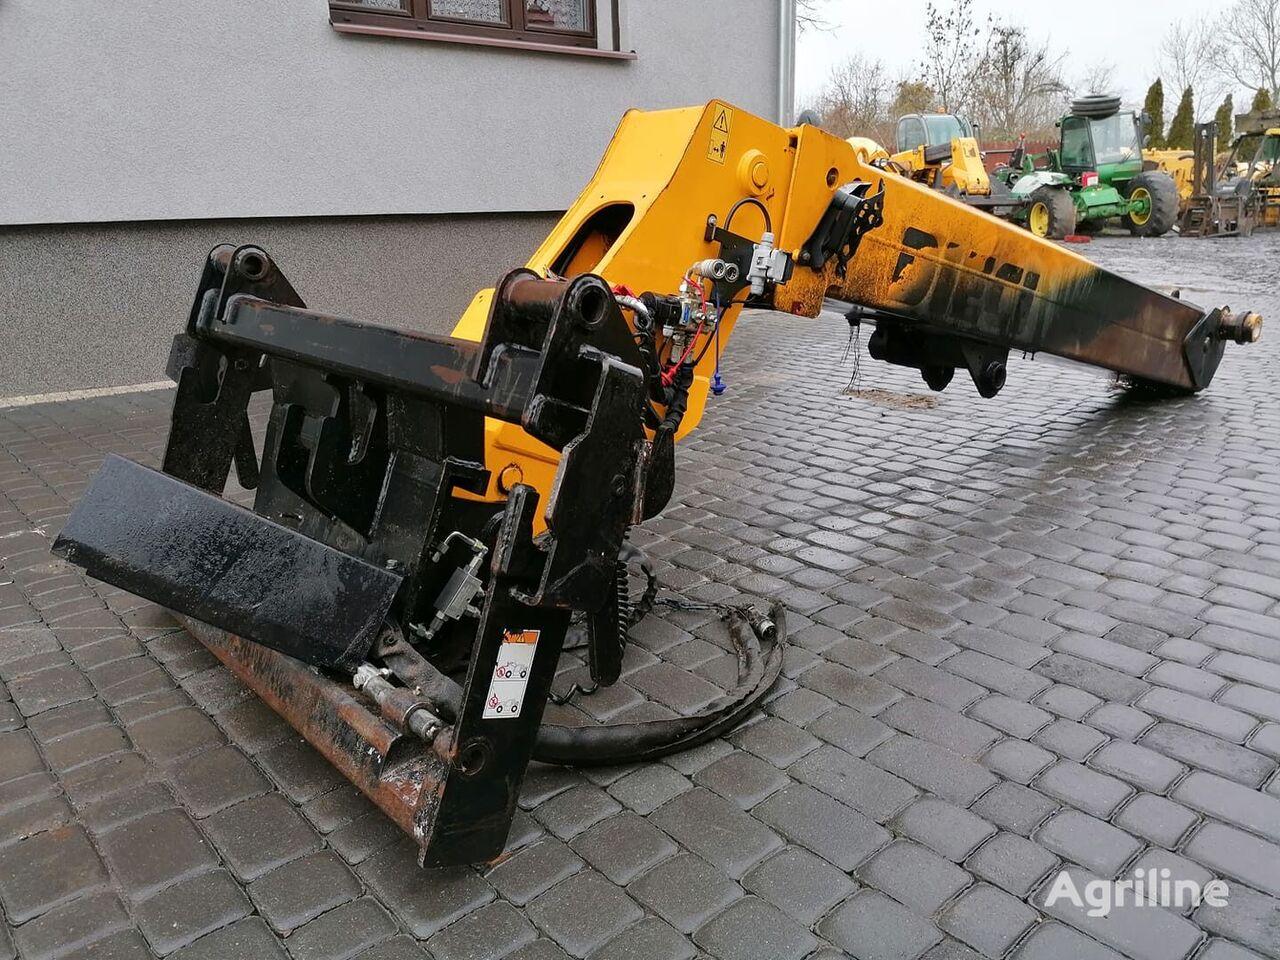 Maszt Ramię Kompletny Dieci 32.6 forklift mast for tractor